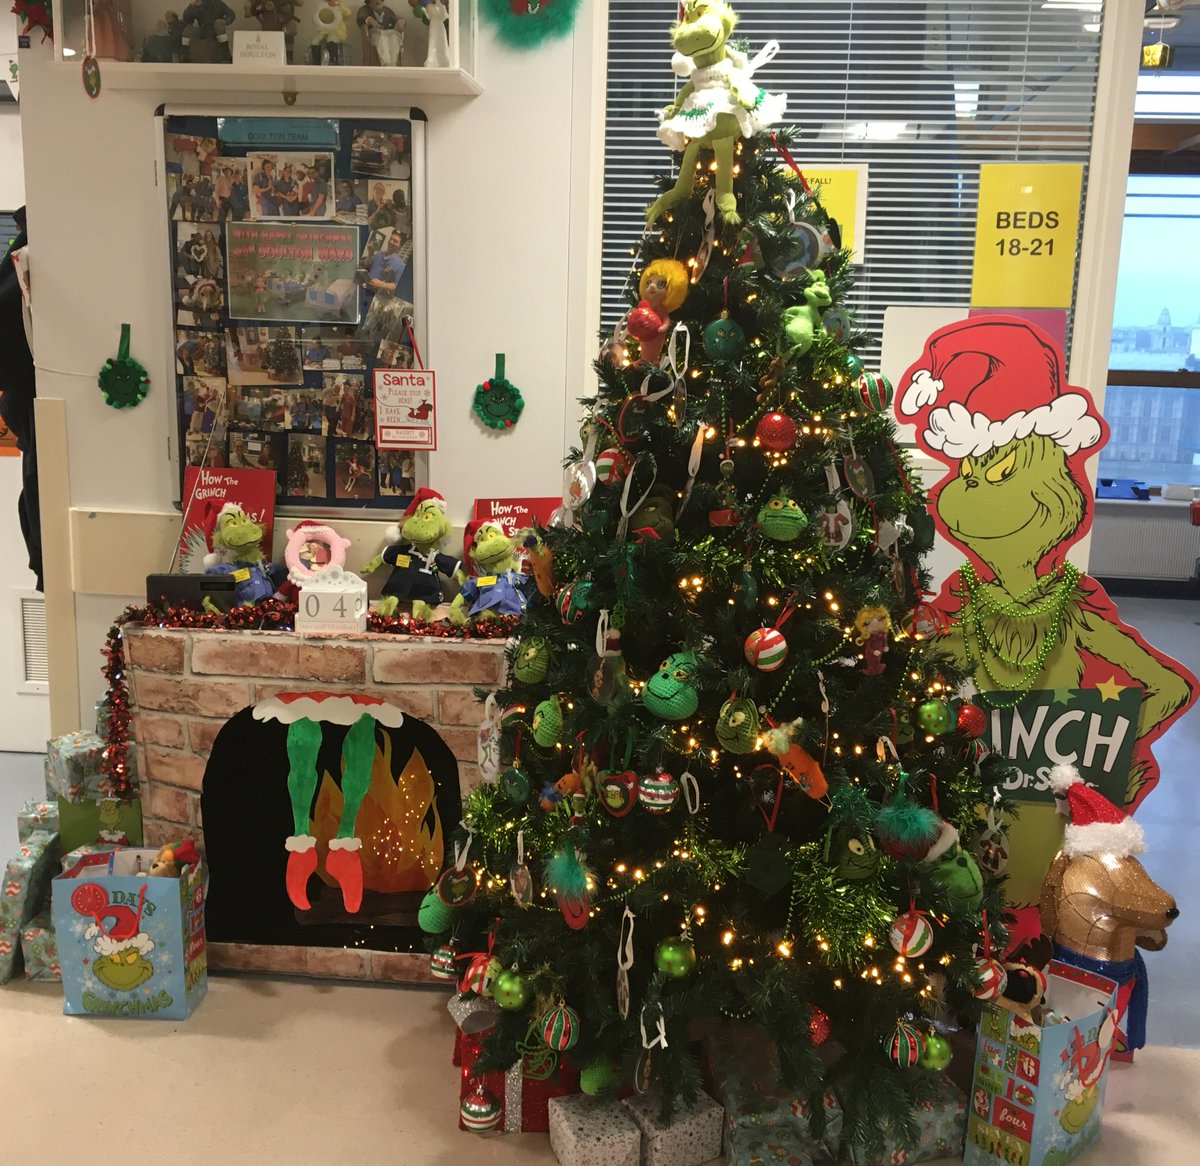 Grinch Christmas Decorations Hospital